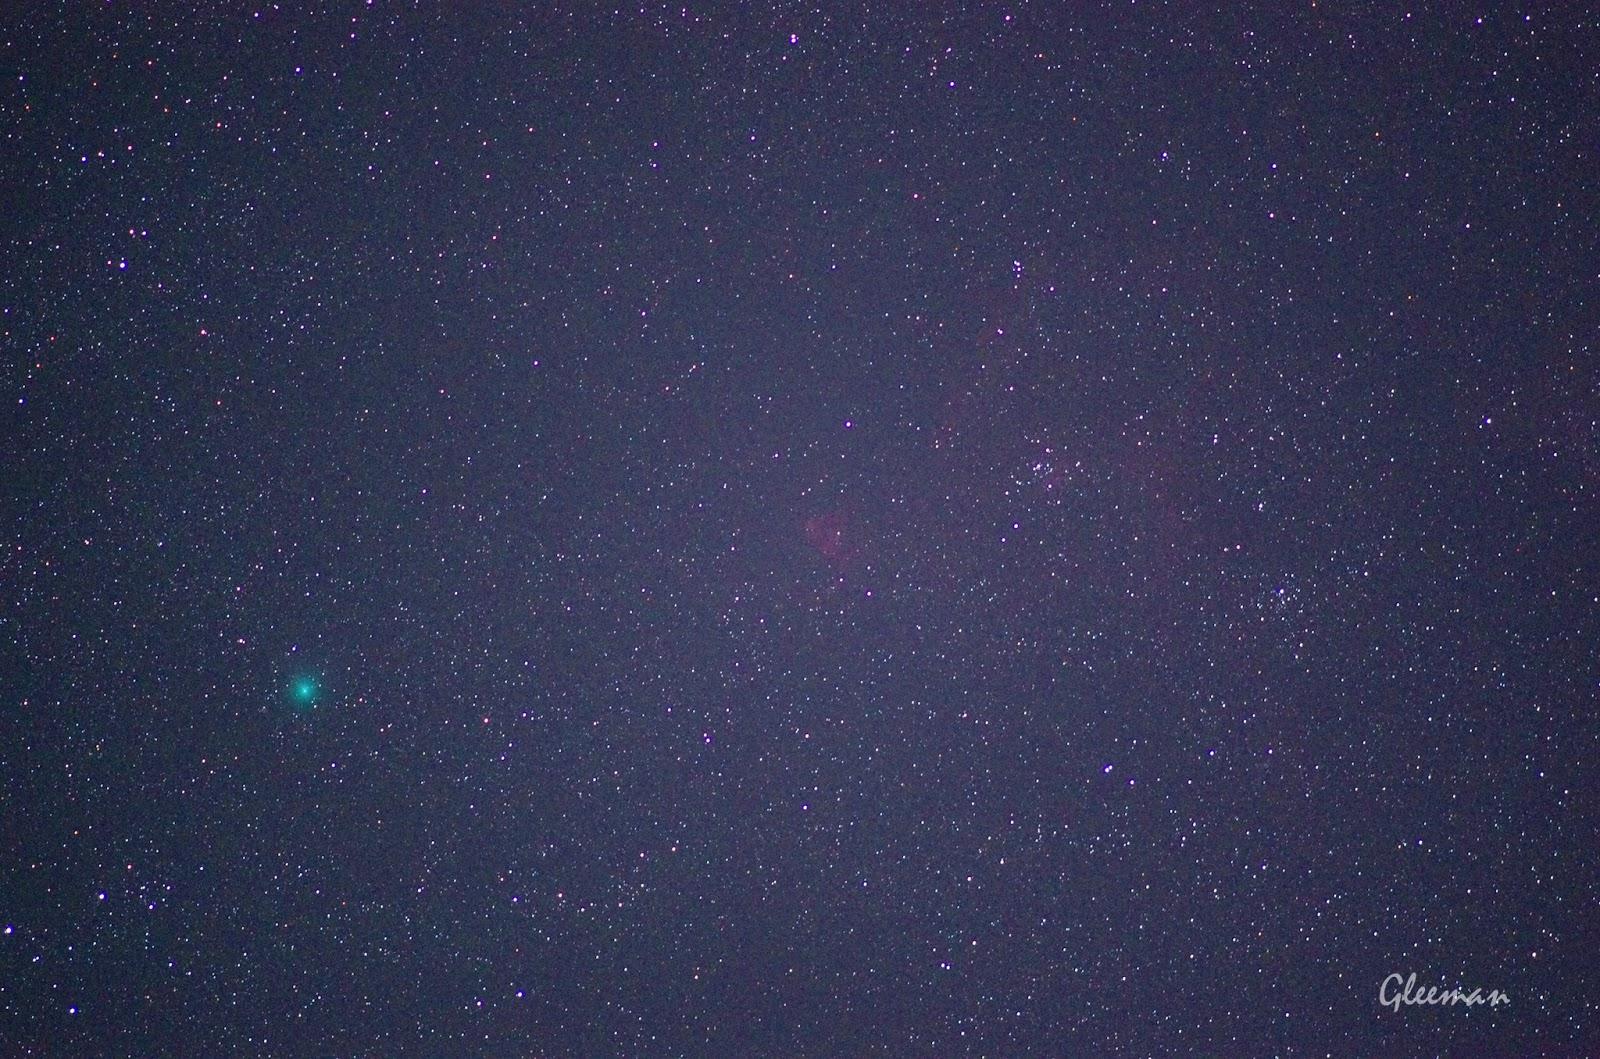 Comet Jacques & Heart nebula, Pentax K5 /O-GPS1/DA*200/ LPS-P2 filter ISO5000 F2.8 40sec